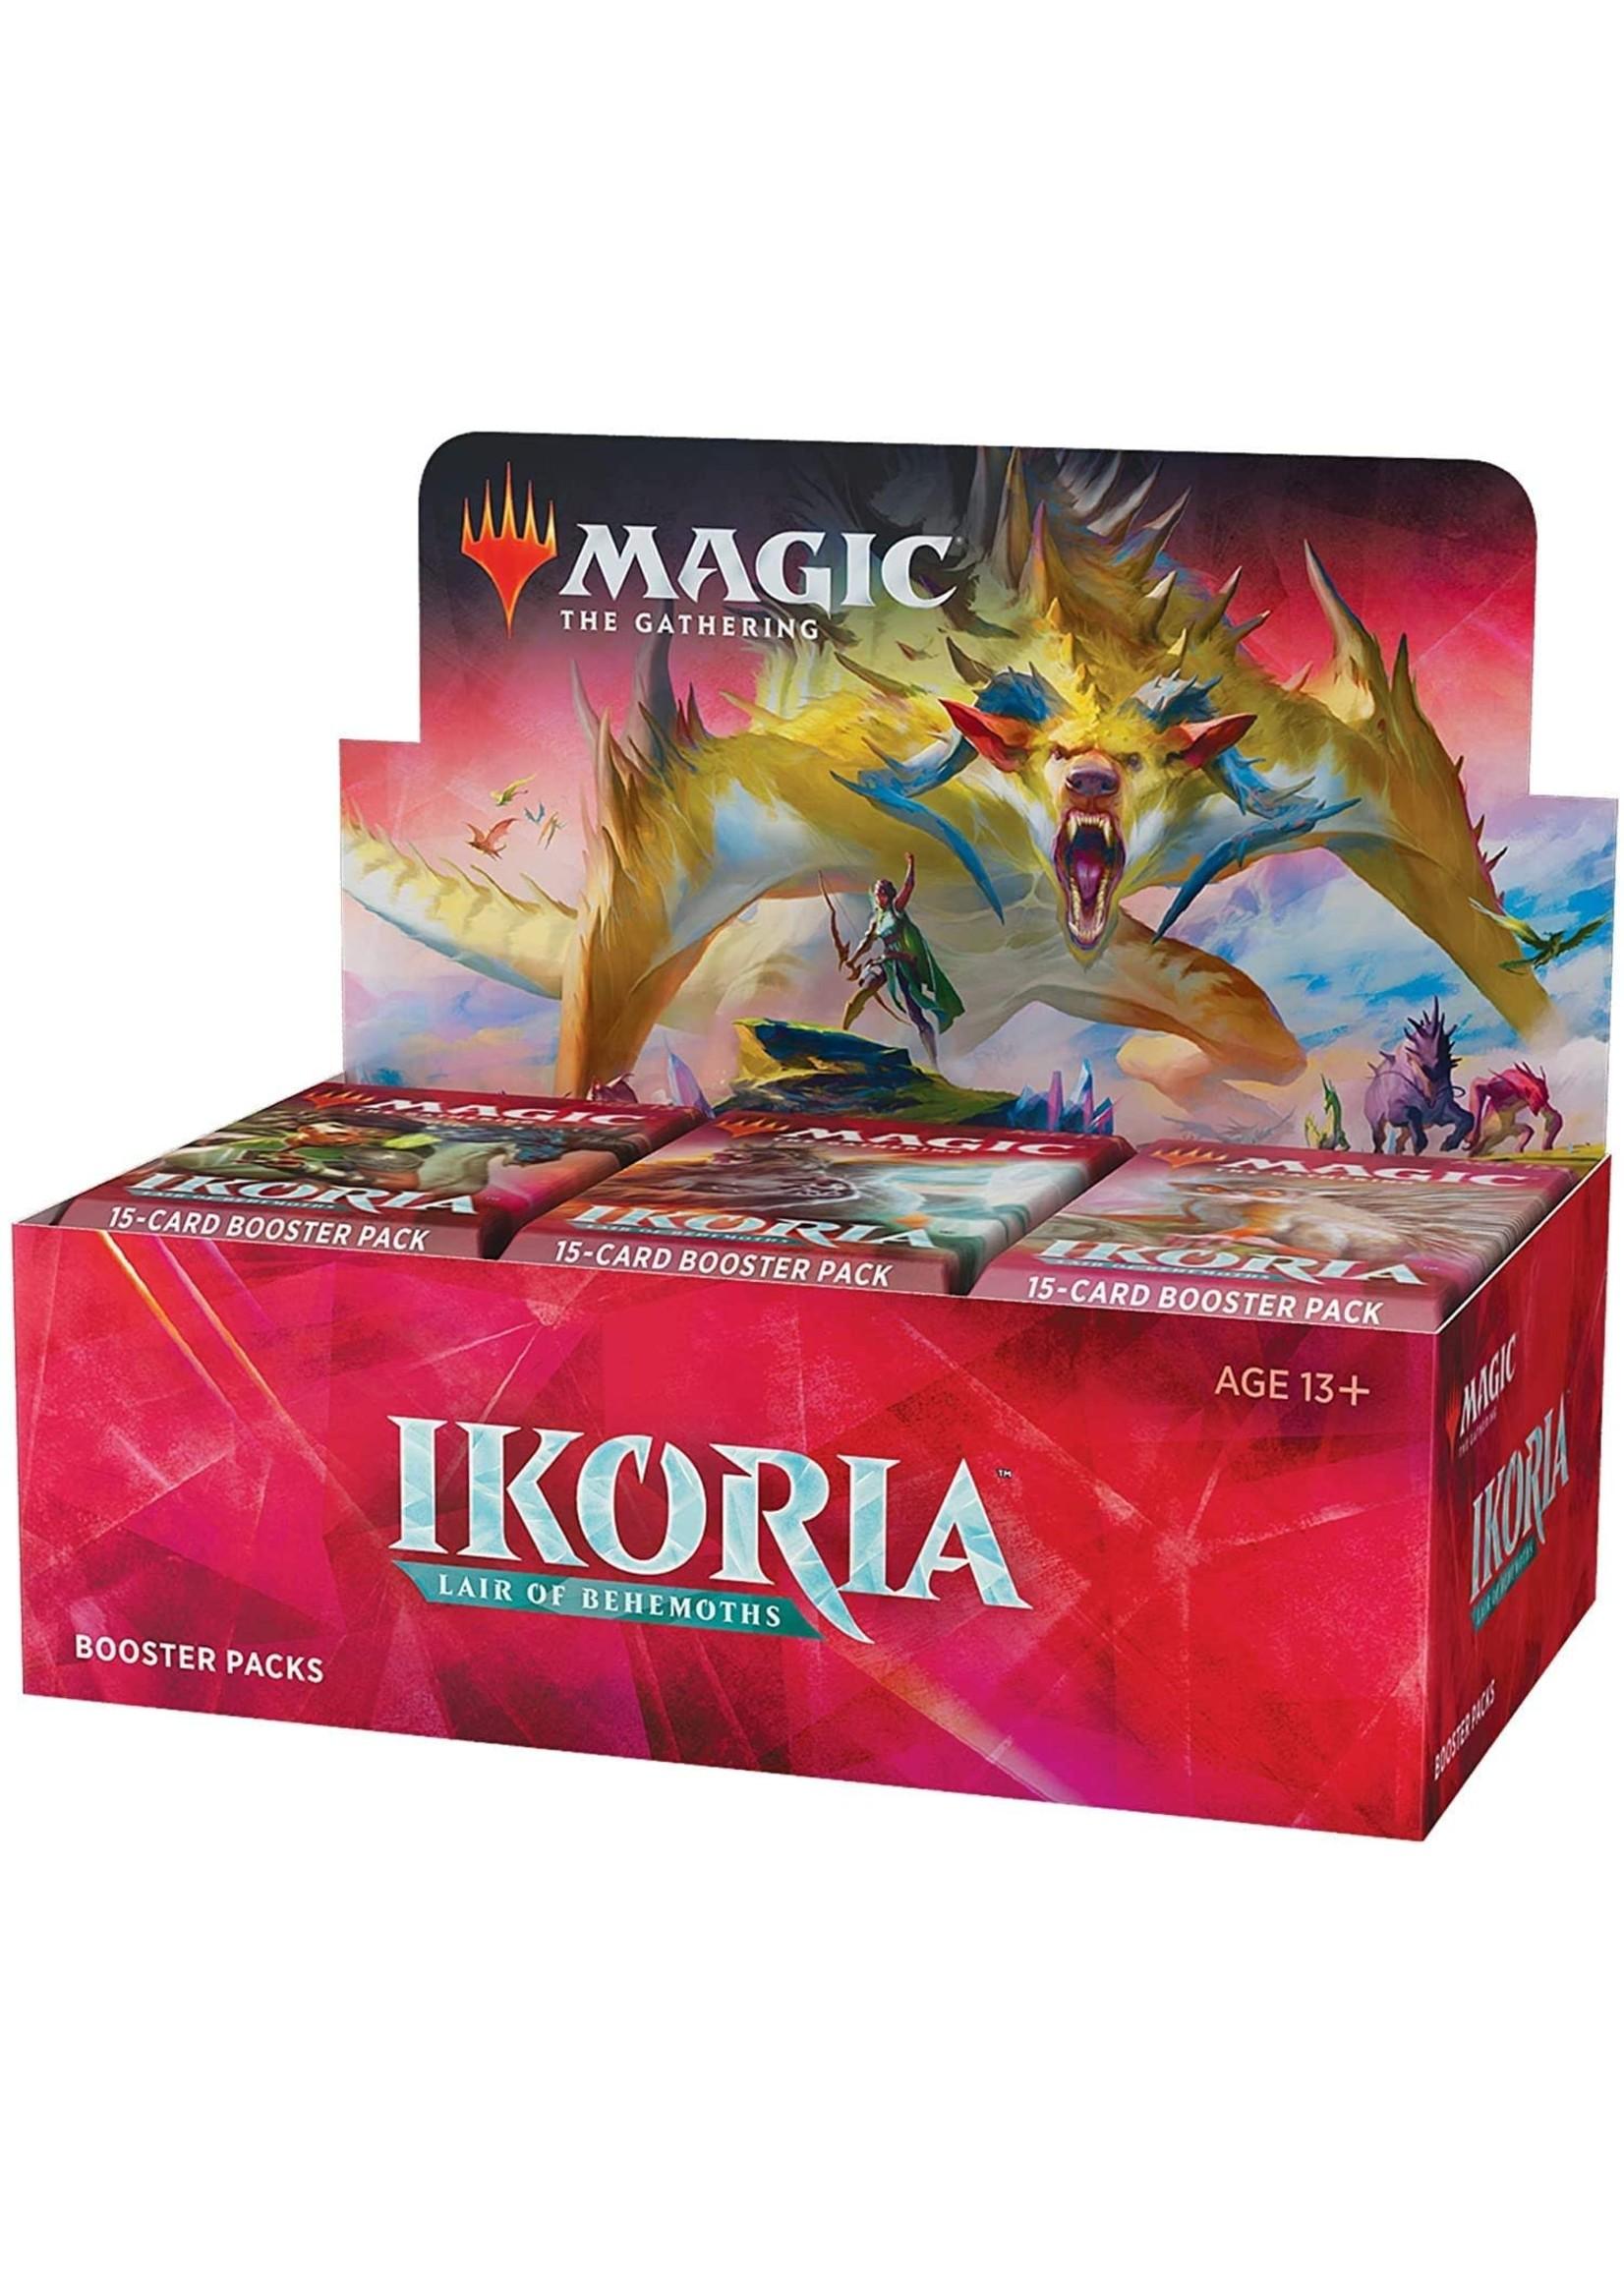 Magic: The Gathering Ikoria Lair of Behemoths Booster Display (36)